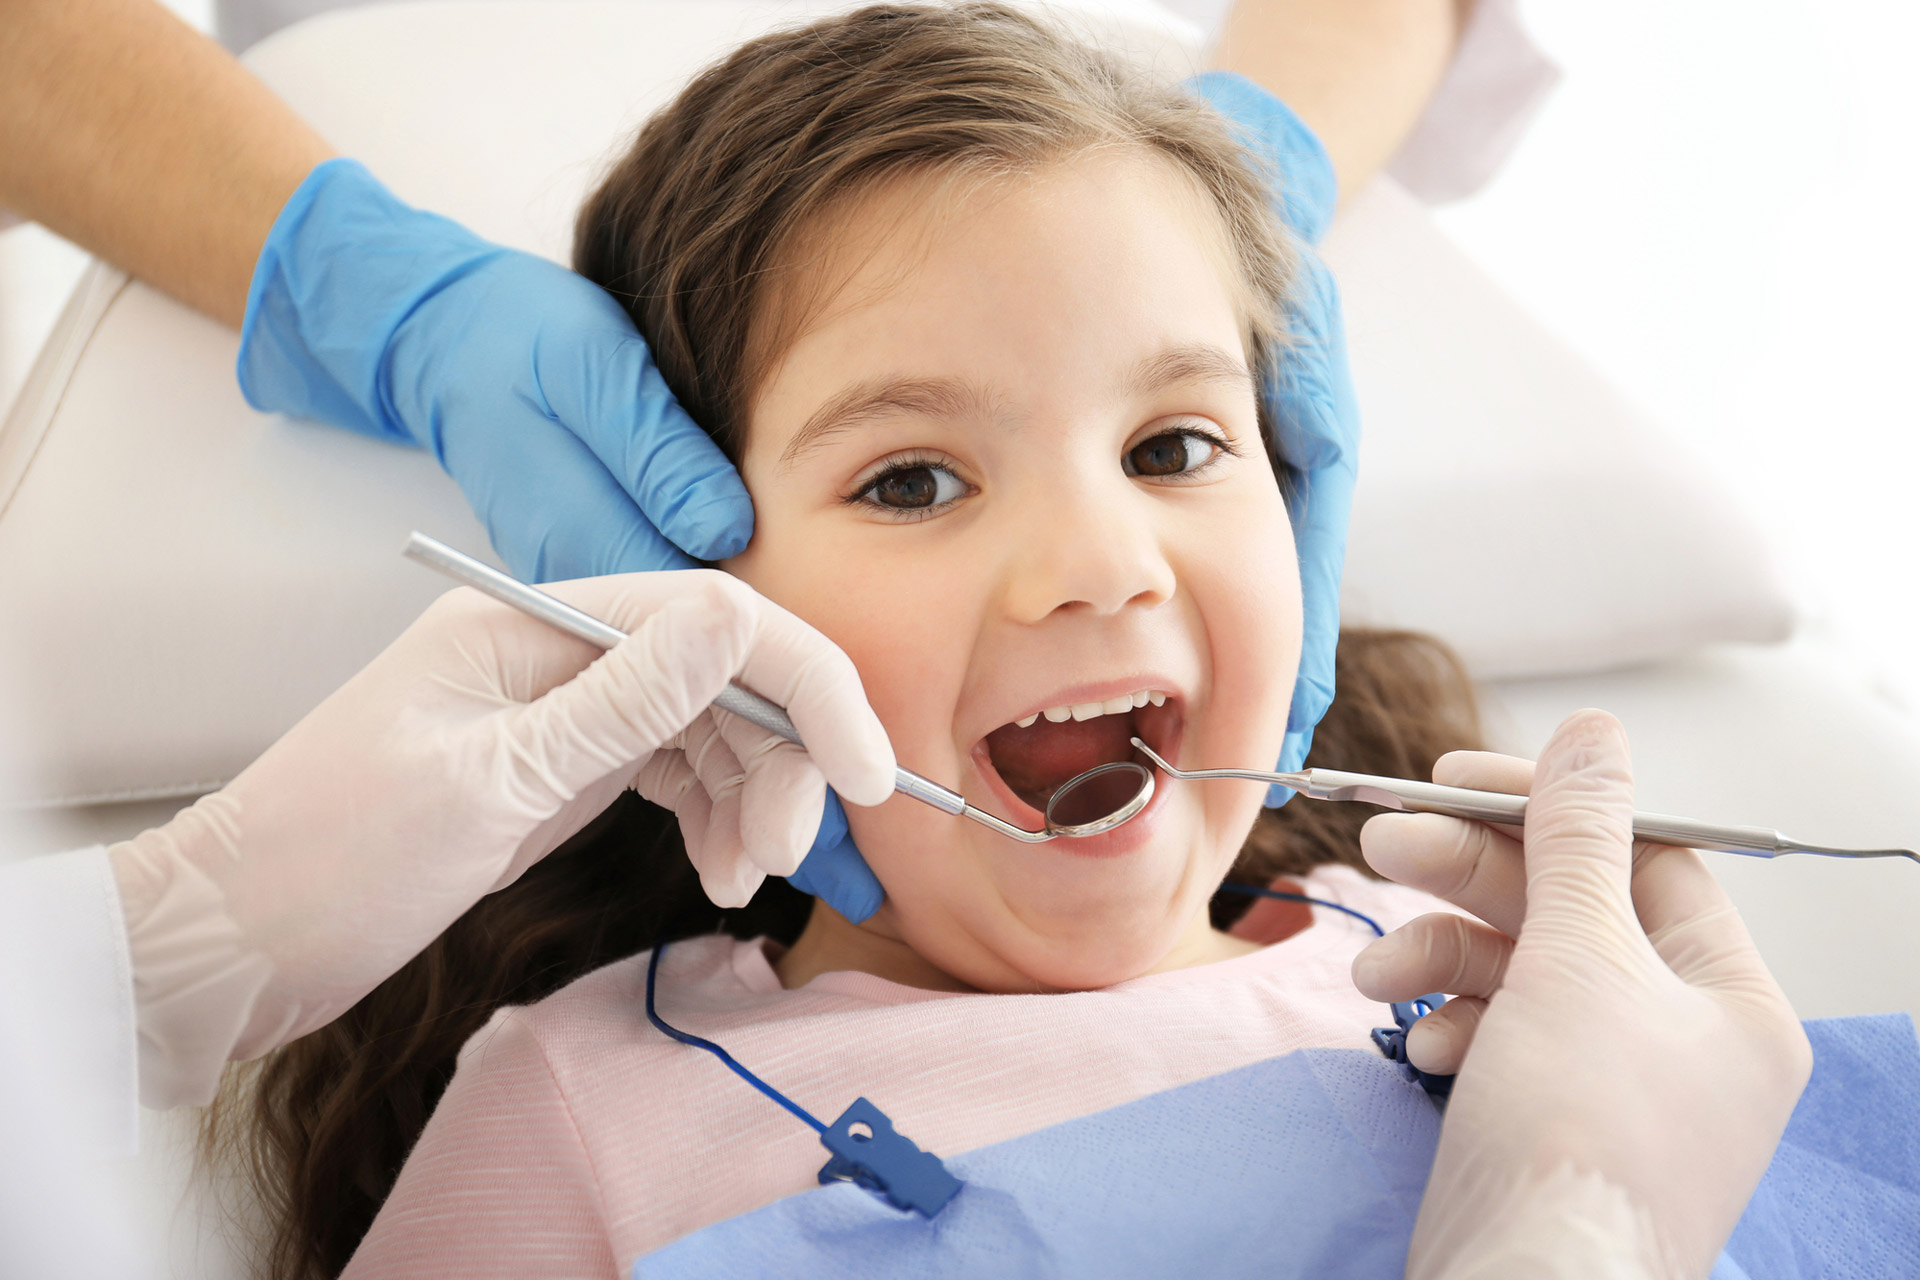 Dentist examining girl's teeth